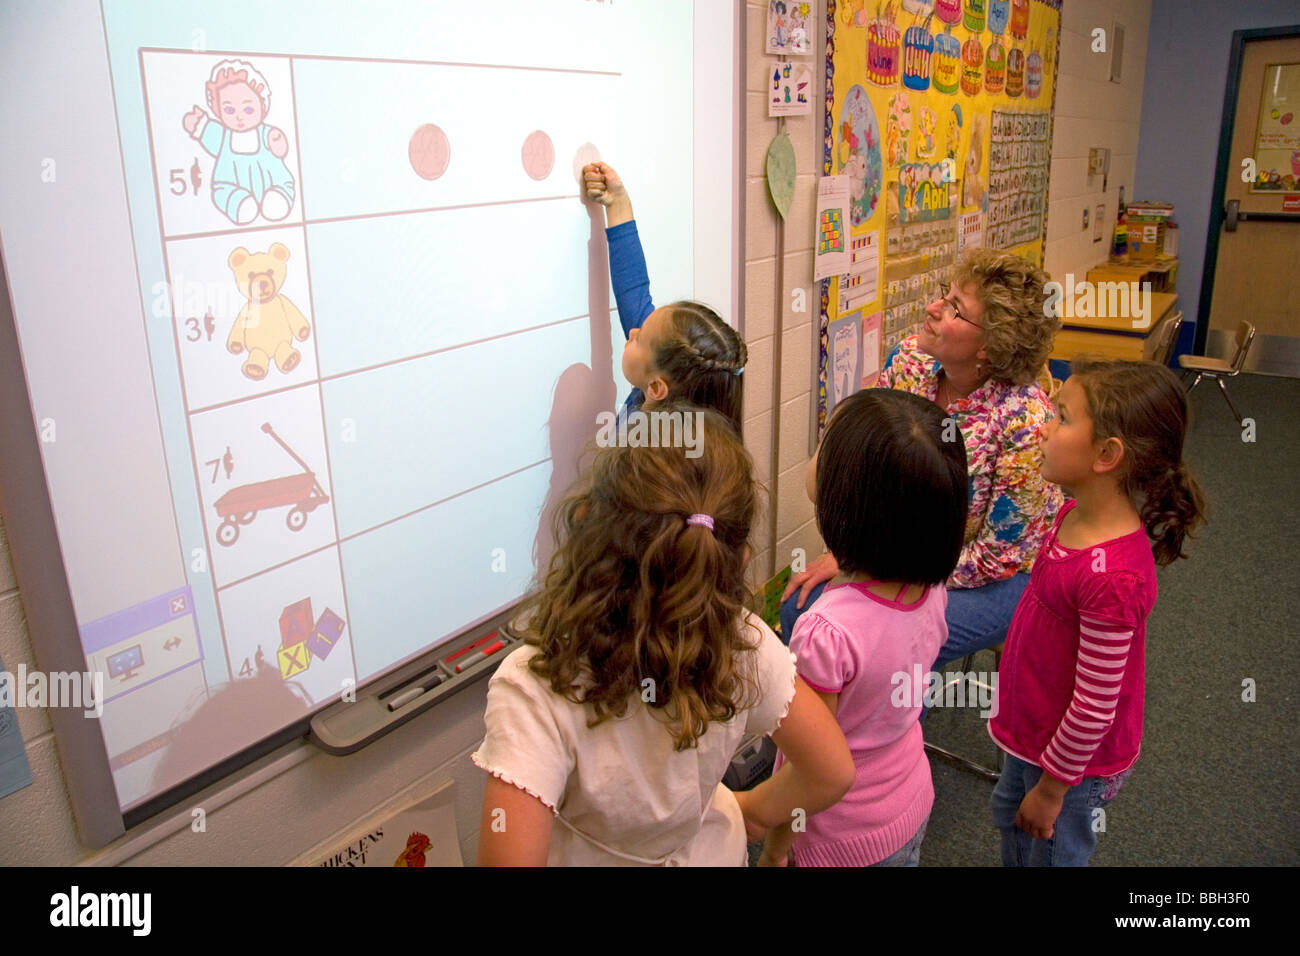 Kindergarten Calendar Interactive Whiteboard : Kindergarten students use an interactive whiteboard in the